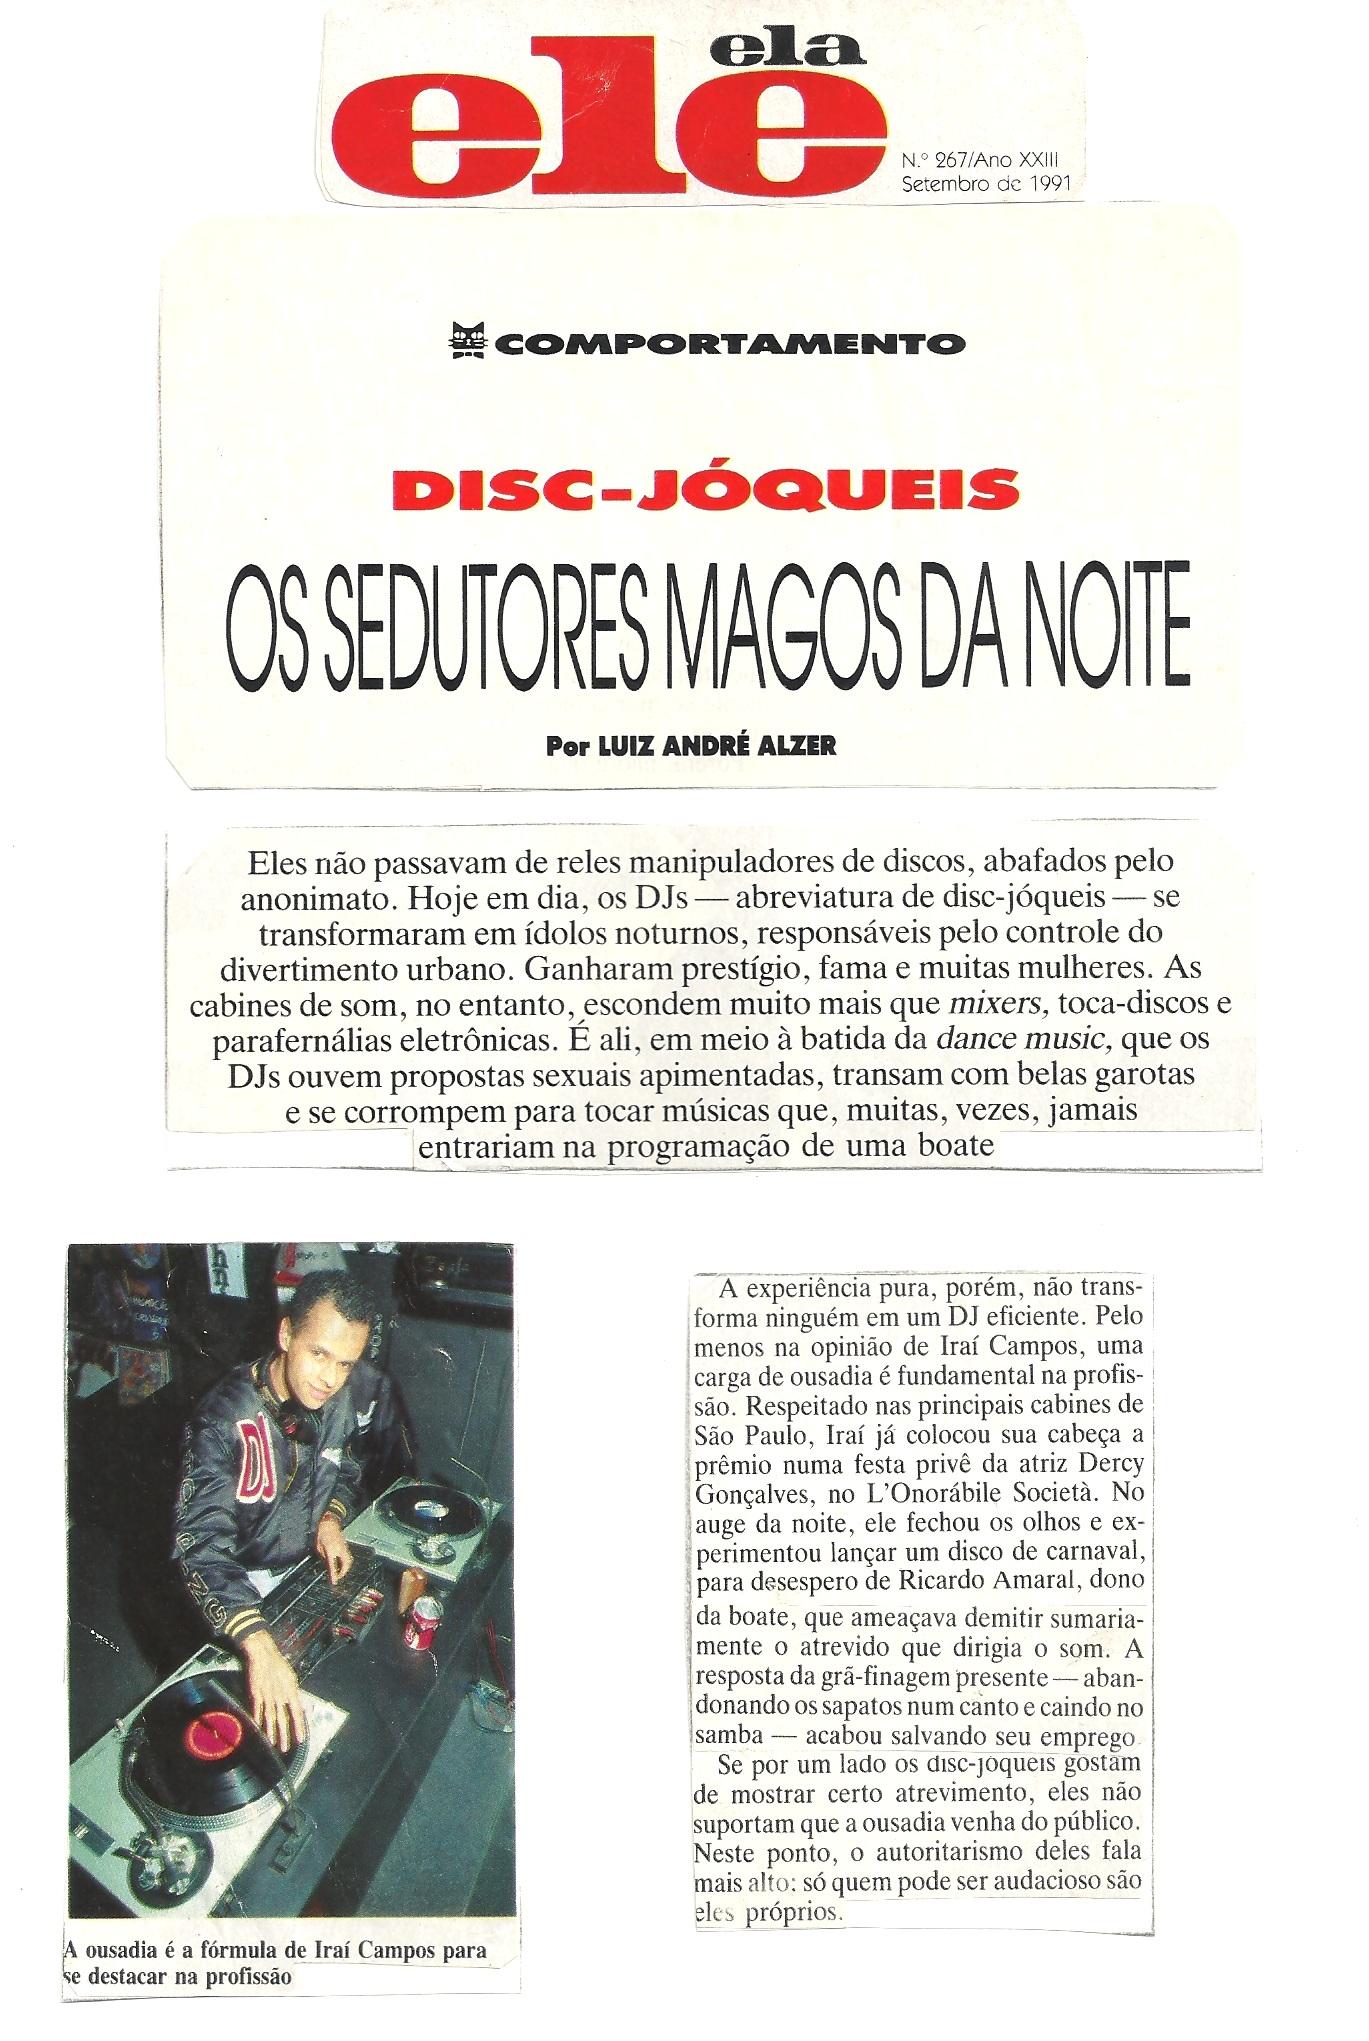 91-09+RevistaEleEla.jpg